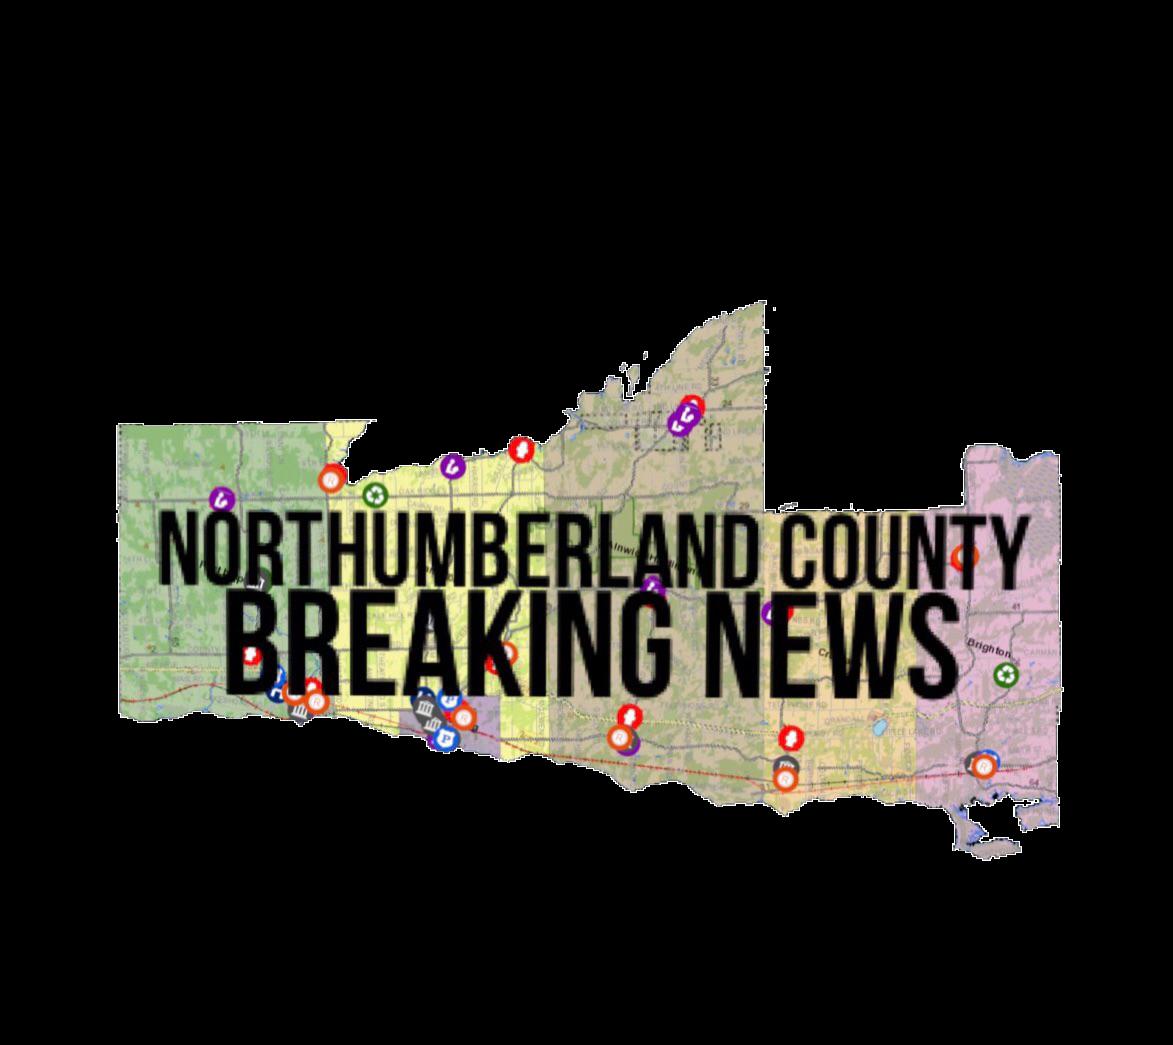 Northumberland County Breaking News Feed